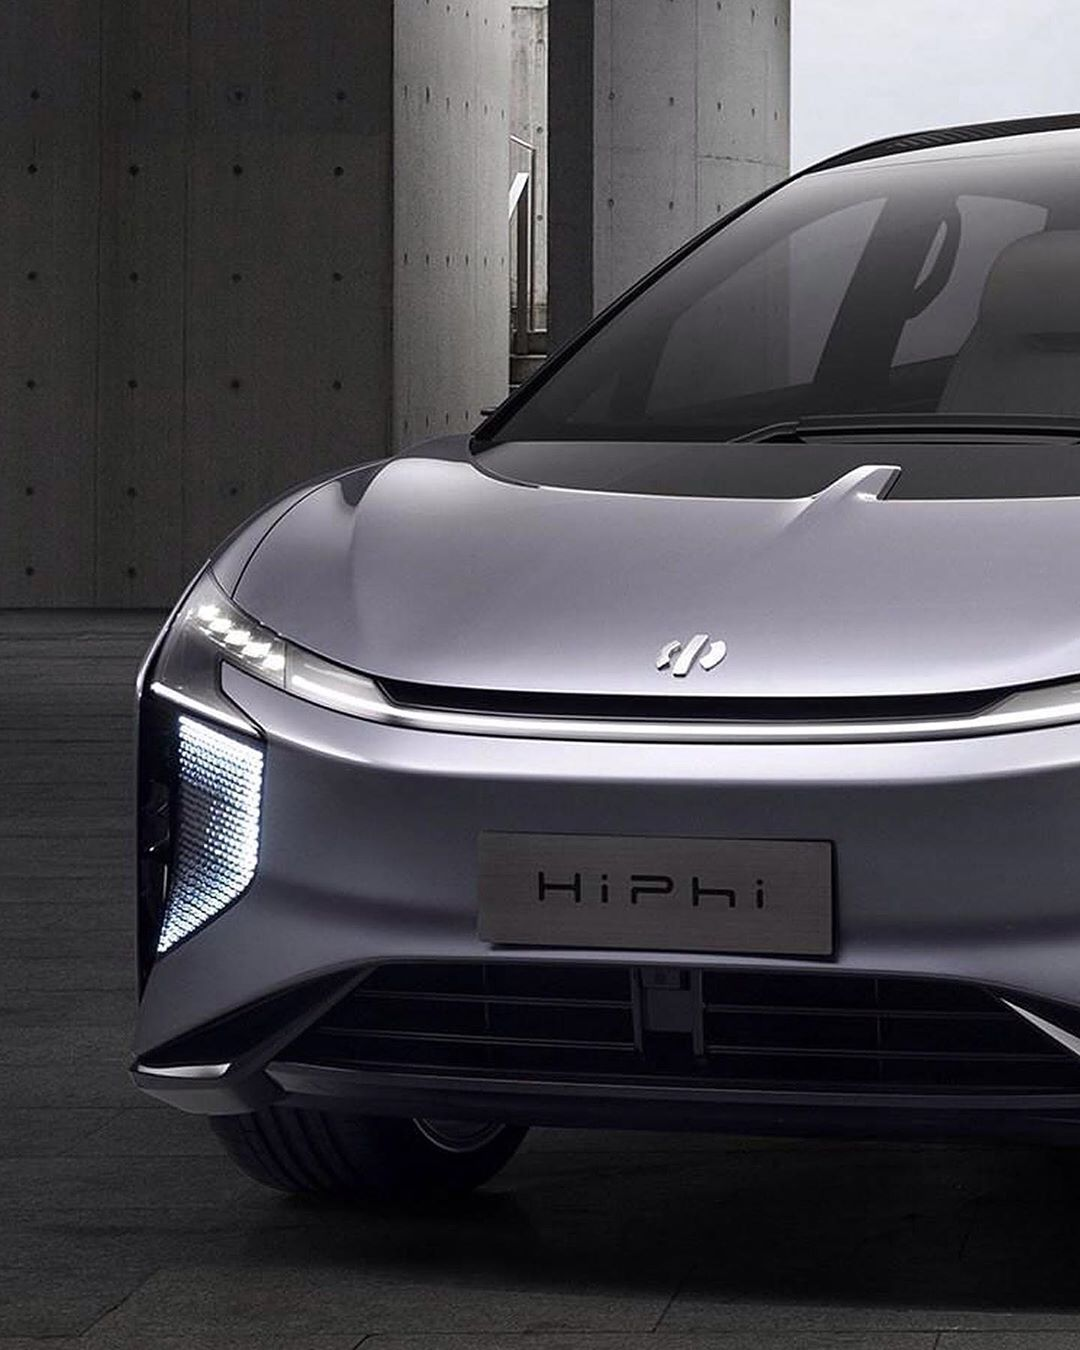 @cardesignworld car design voiture de luxe voitures de luxe tuning automobile automobiles futur concept car design voiture